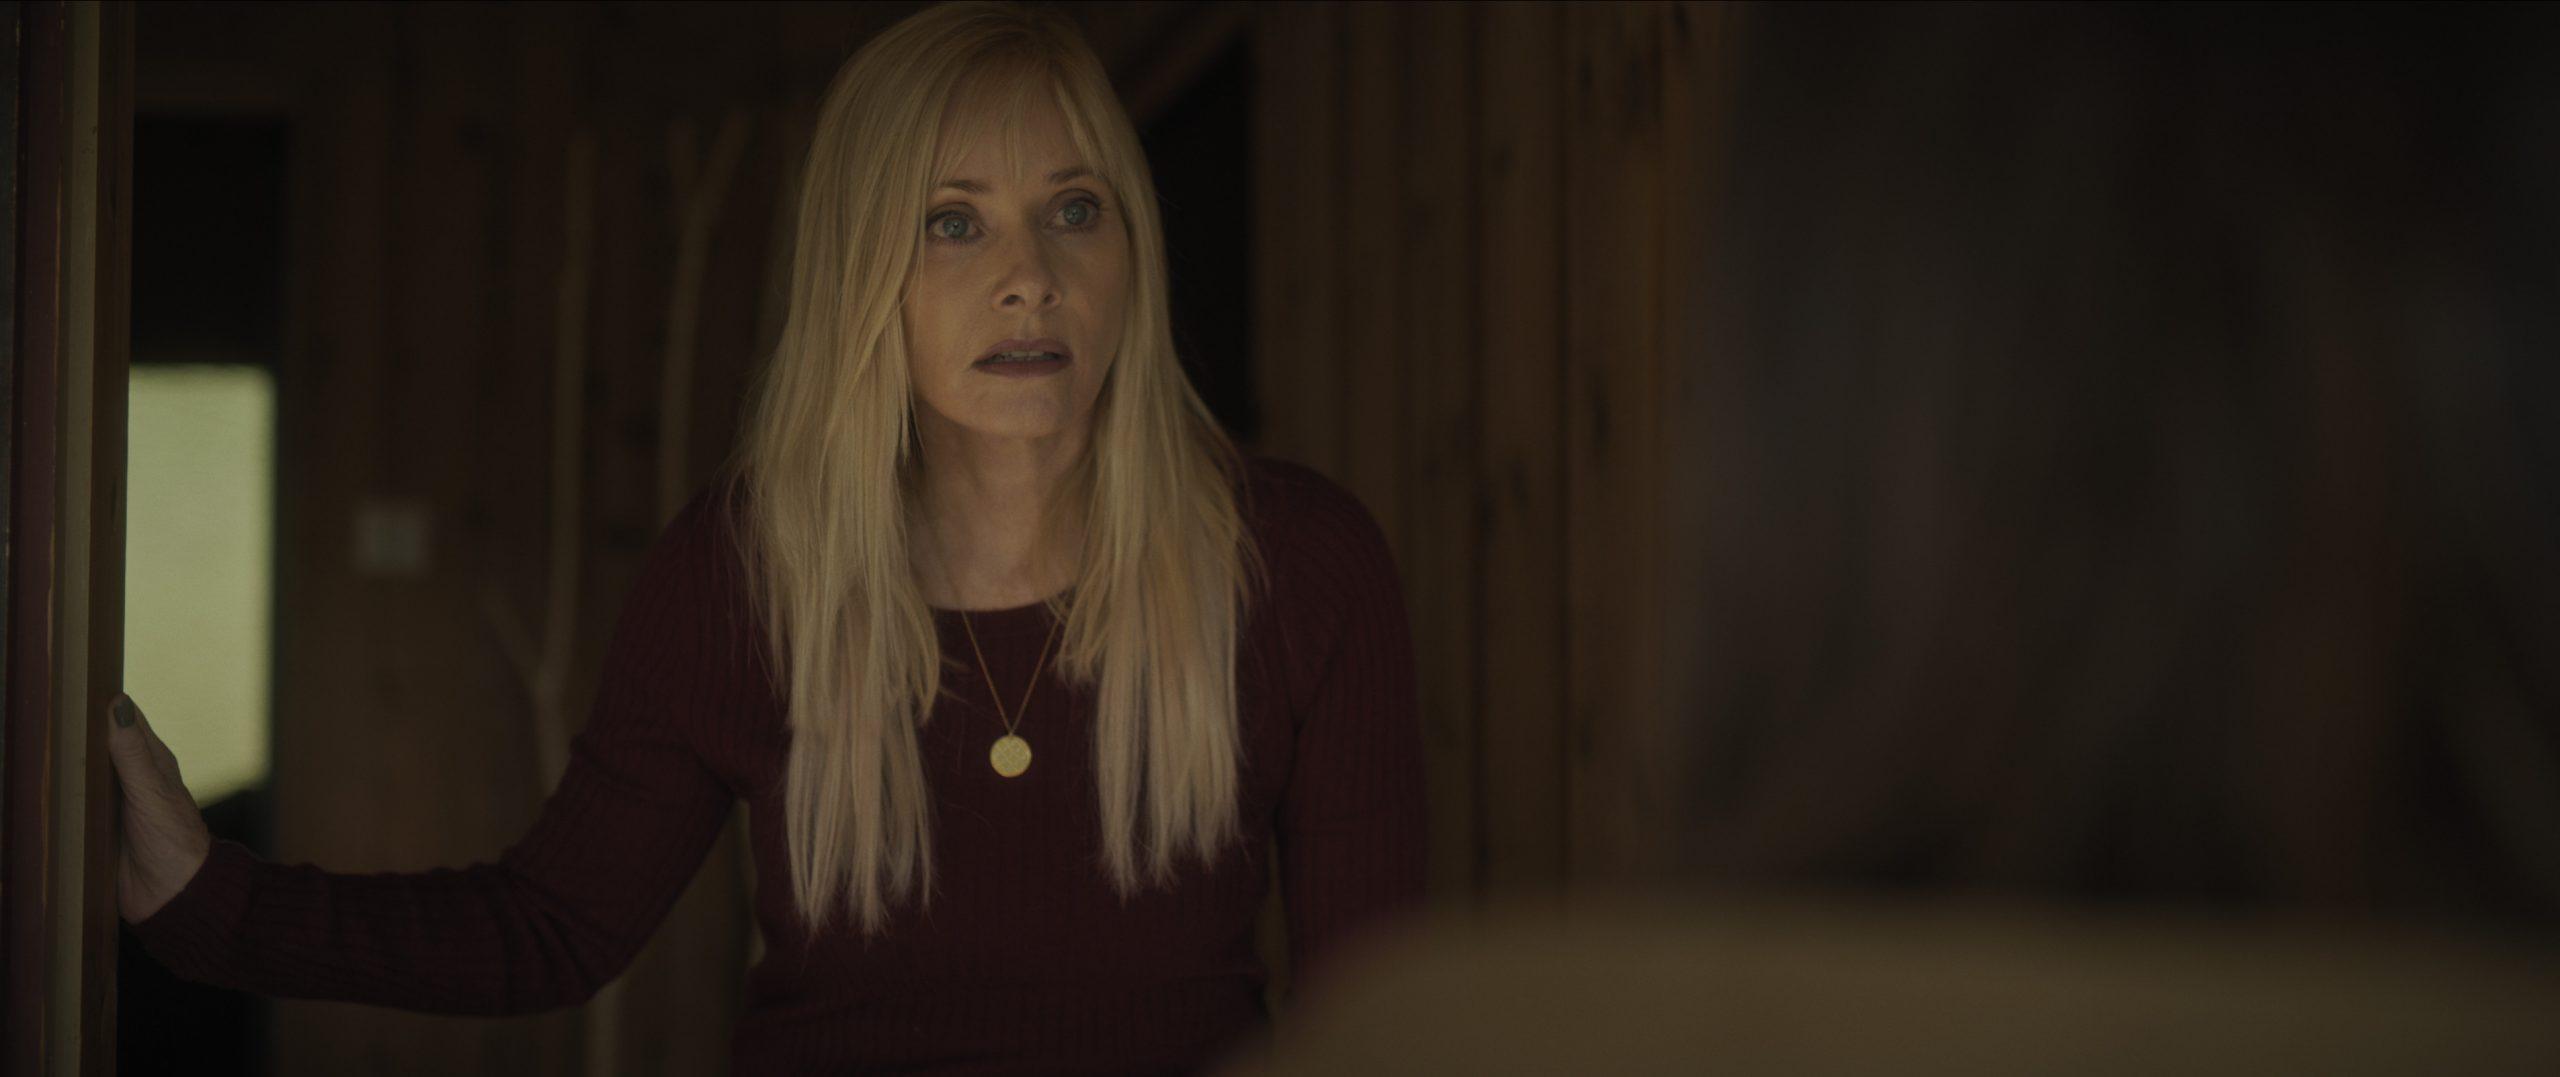 [News] Epic Pictures & Dread Acquire Horror Films Ahead of Cannes Marche Du Film